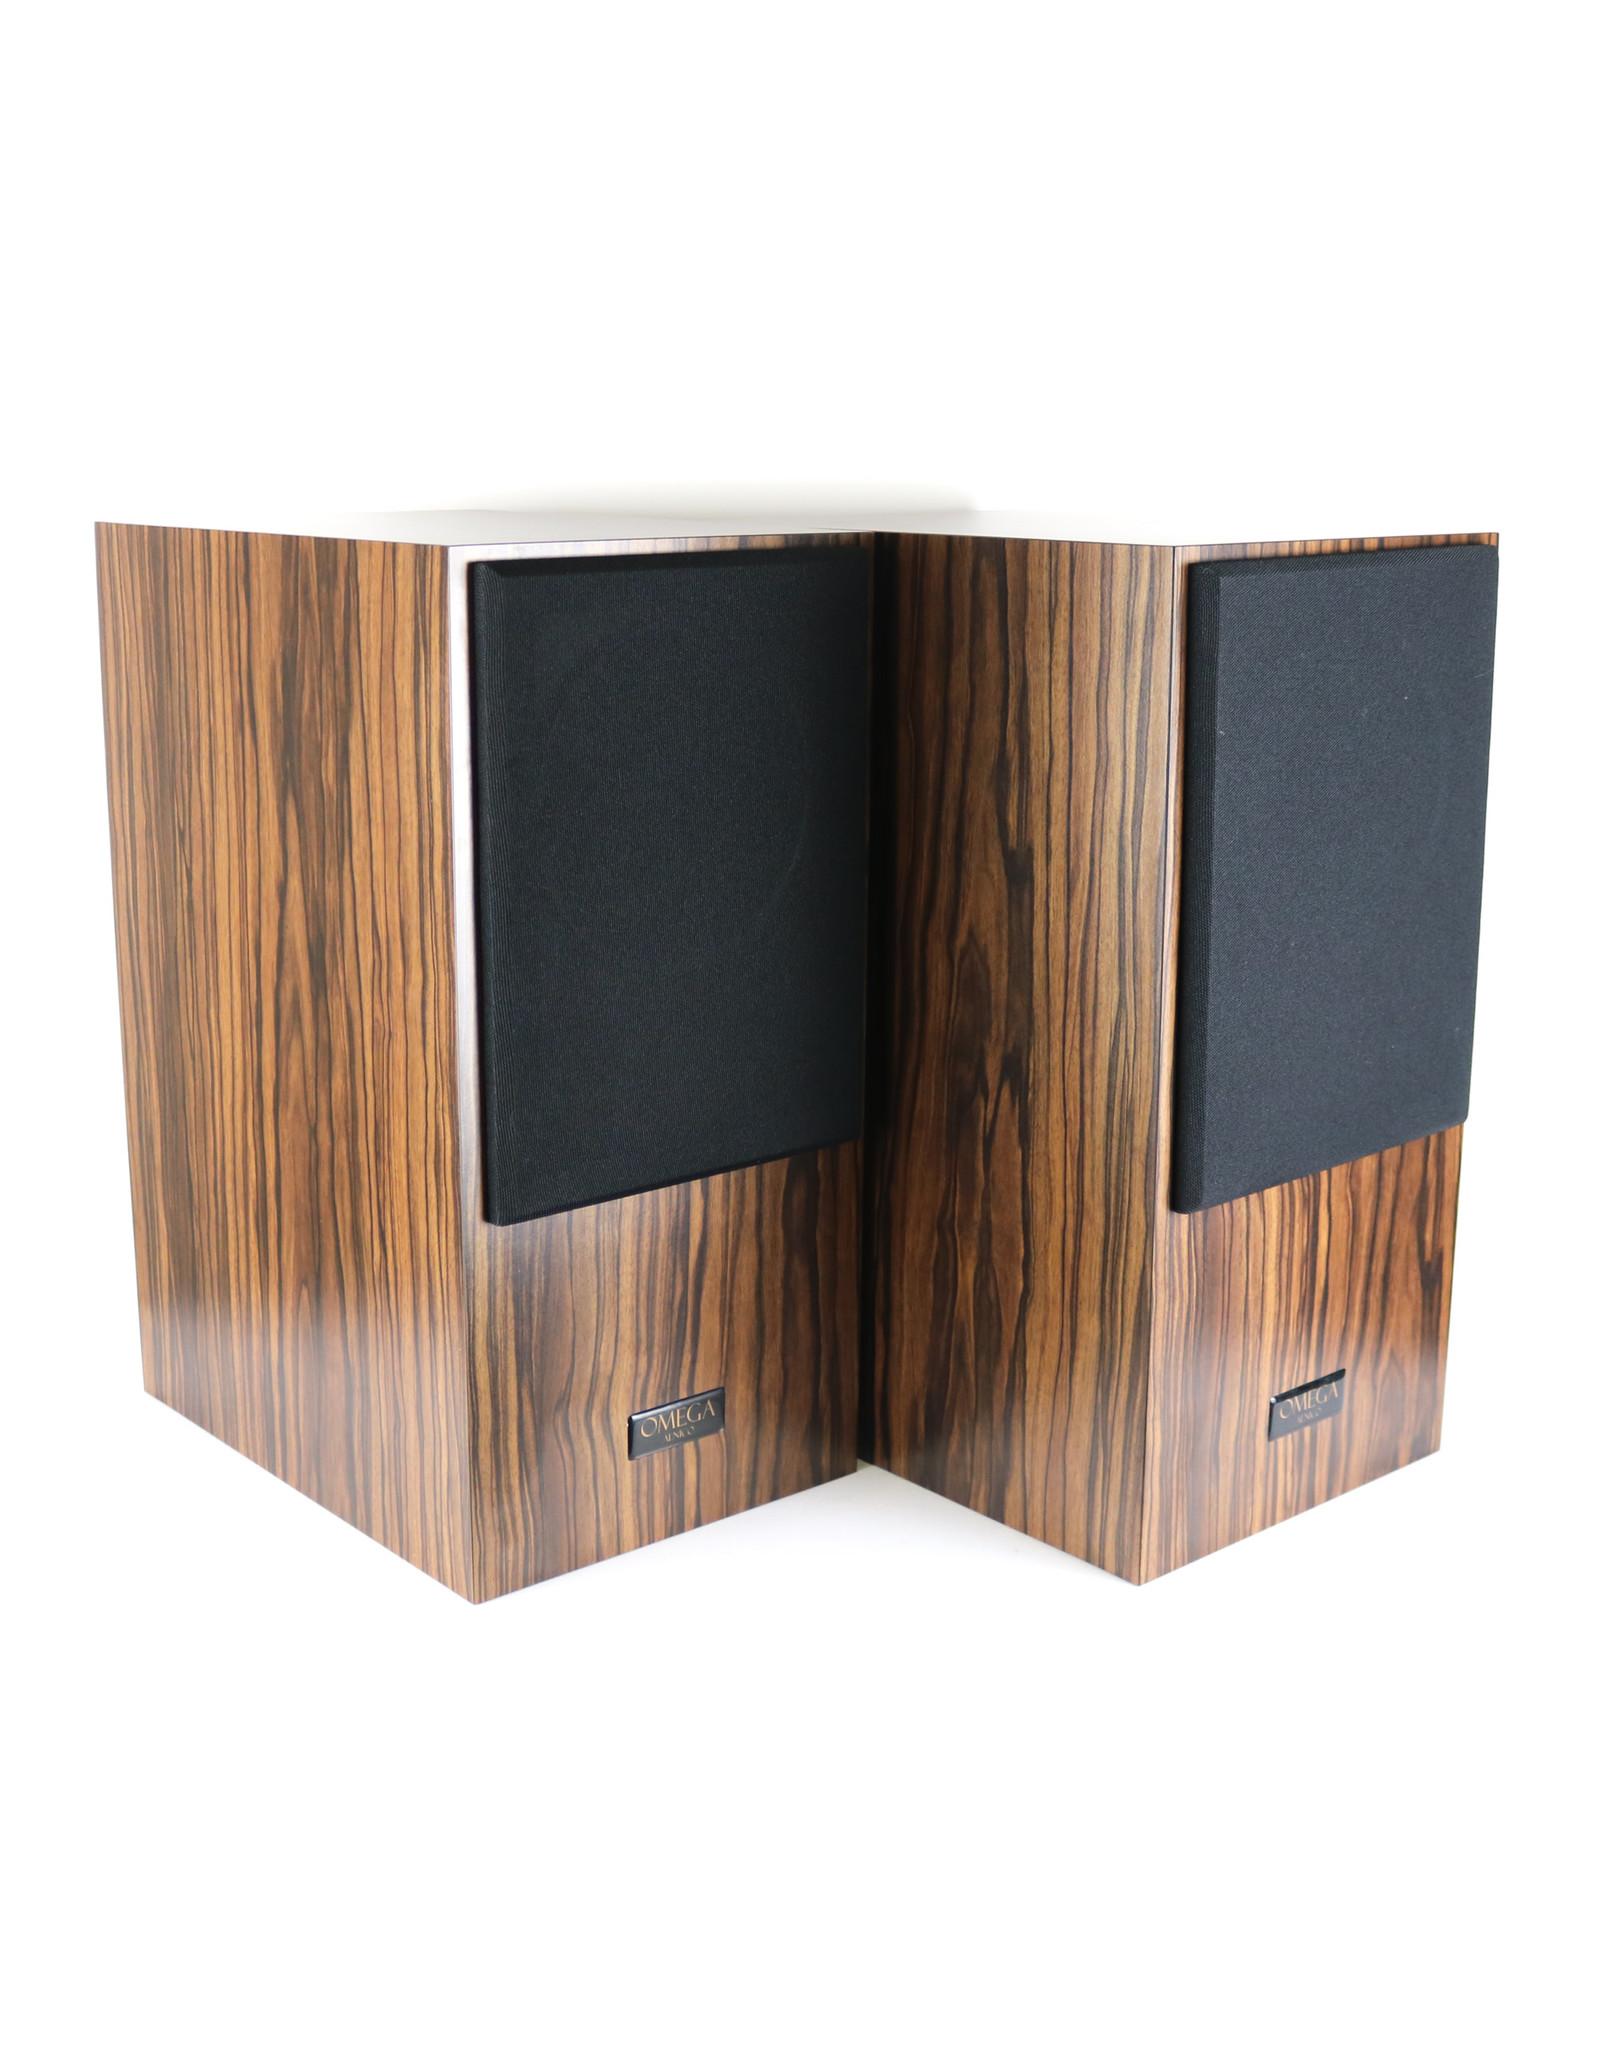 Omega Omega Super 6 Alnico Bookshelf Speakers USED